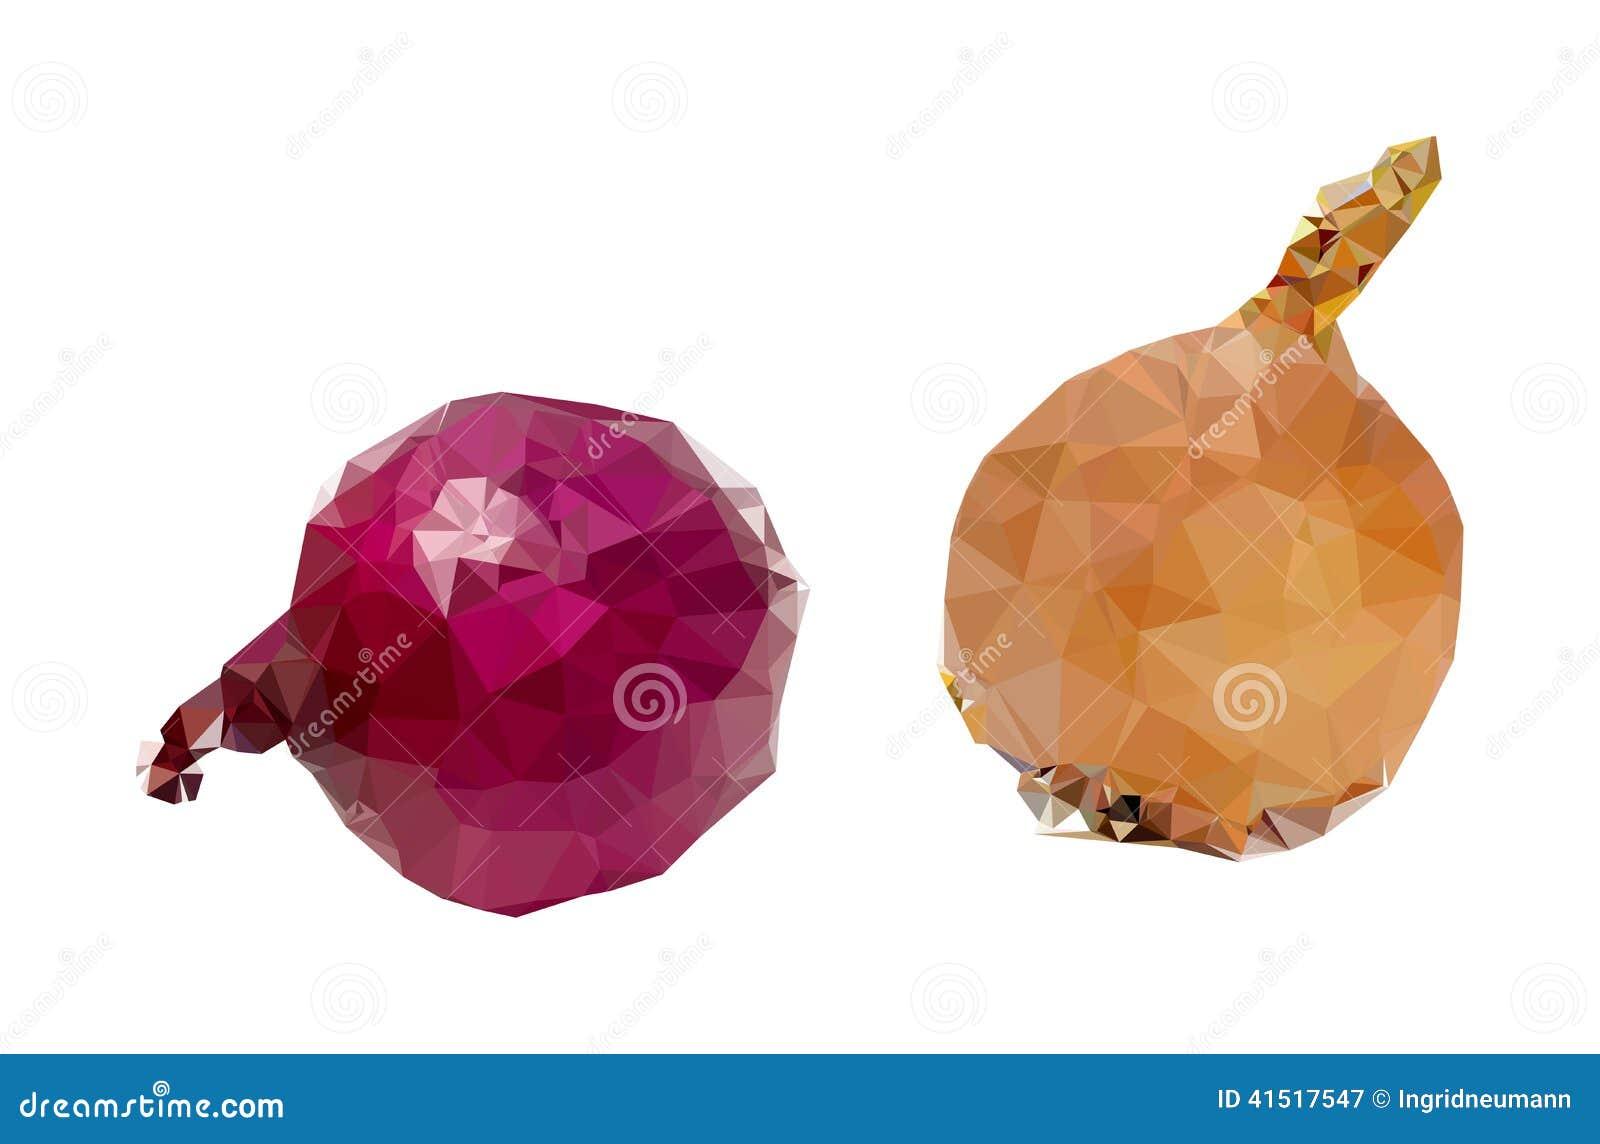 Red Onion Illustration Polygonal Onion Illustration